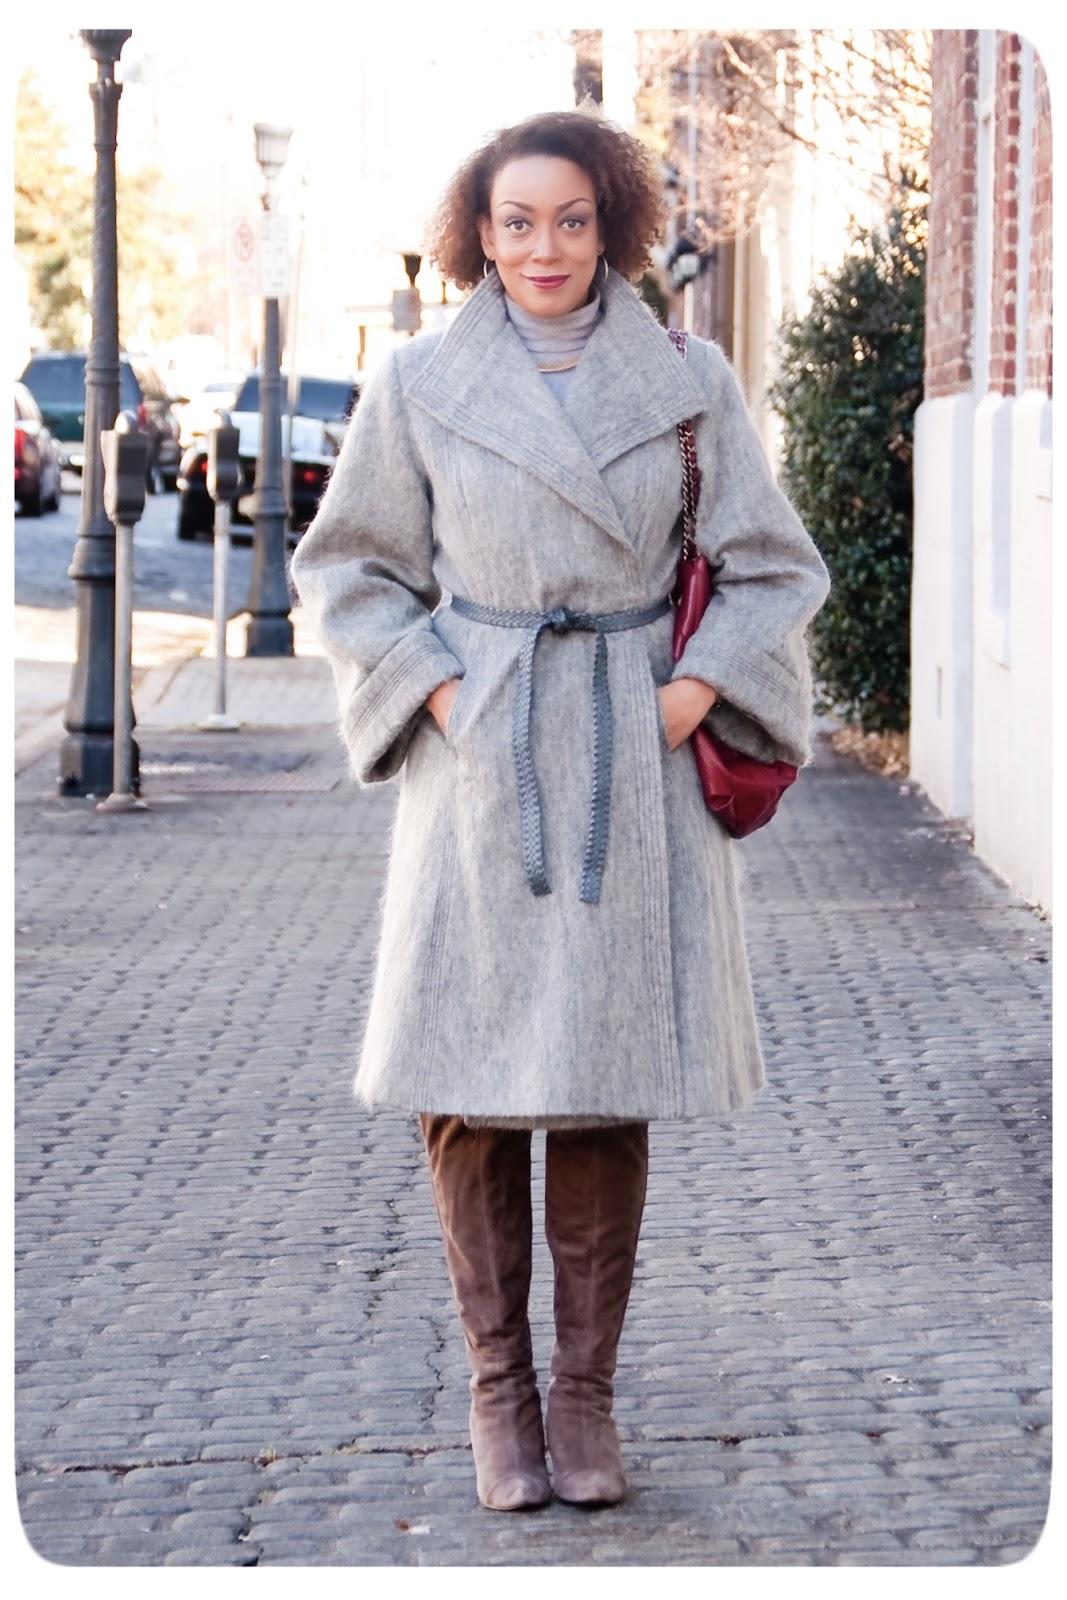 Vintage Vogue 1023 - Vogue Paris Original: 1970s Christian Dior Coat. Mohair Fabric from Mood Fabrics - Erica Bs DIY Style!